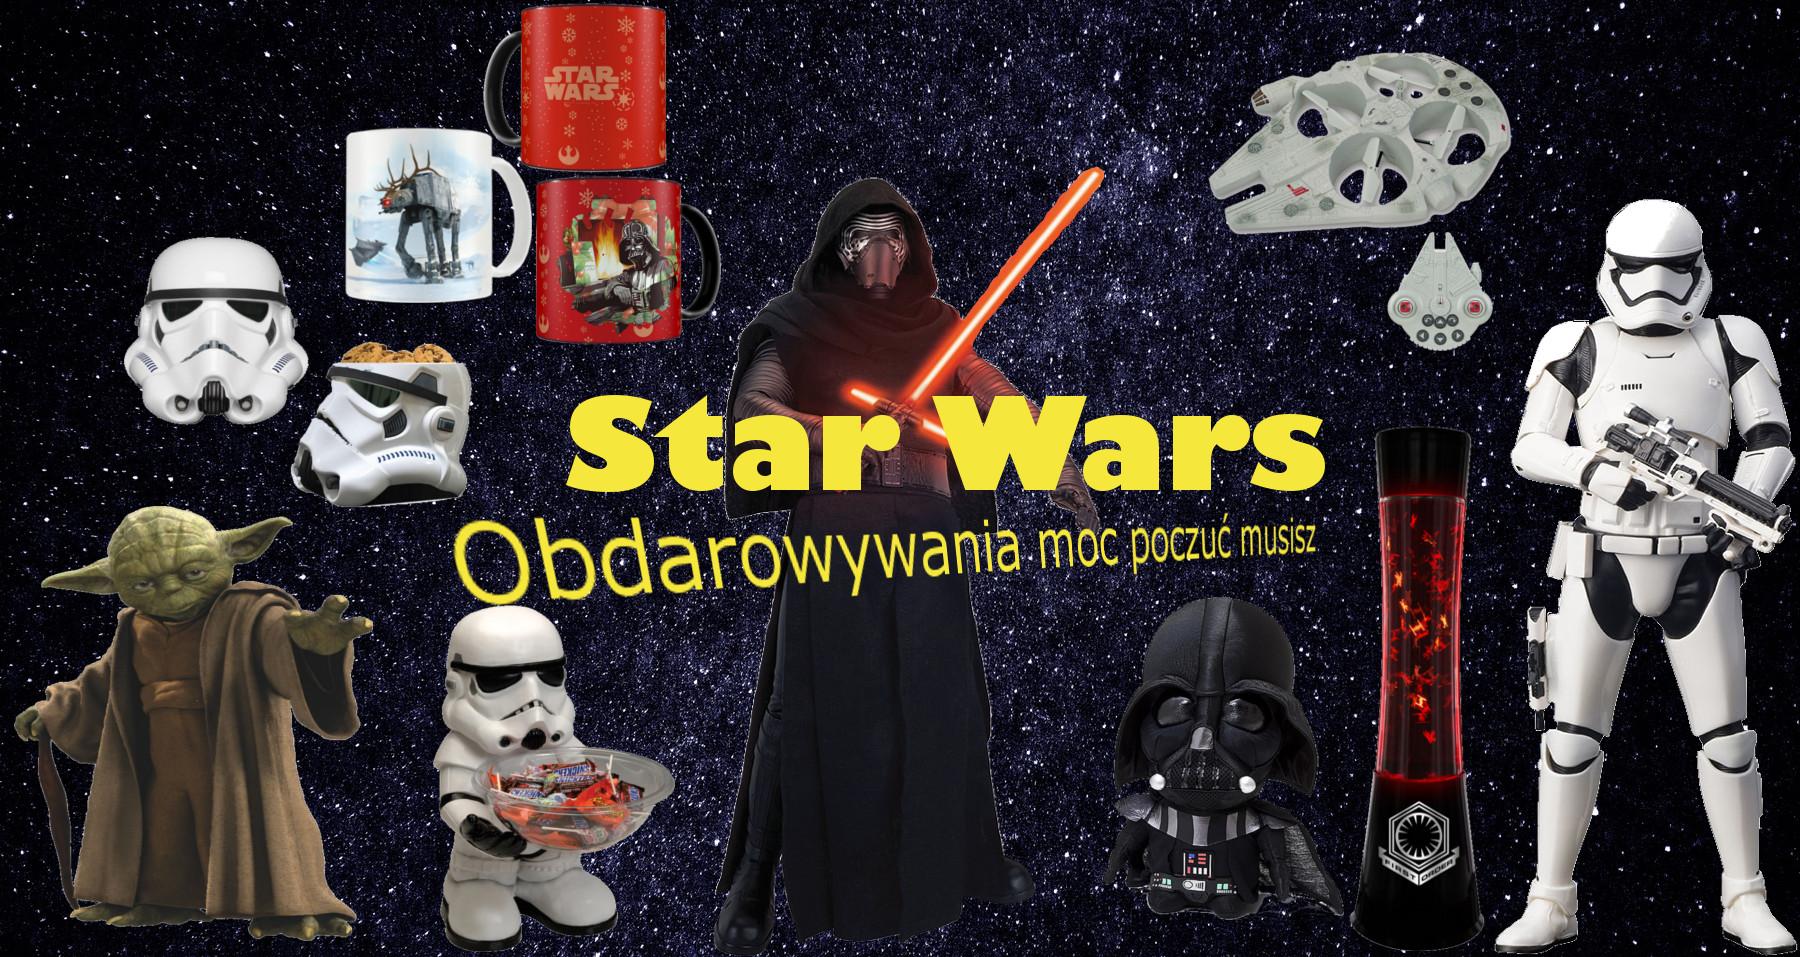 Gadżety star wars